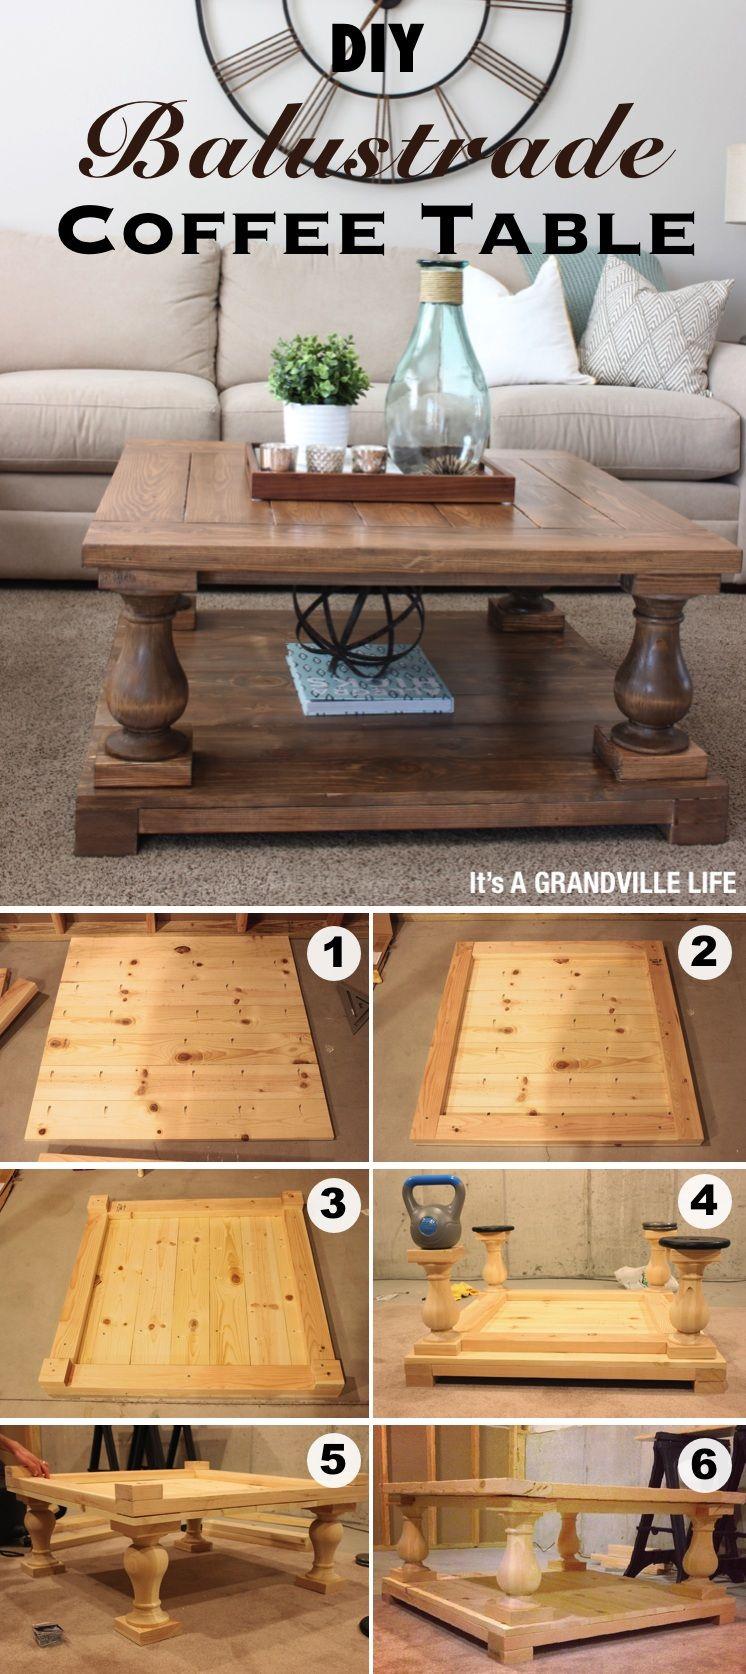 15 creative diy coffee table ideas you can build yourself coffee 15 creative diy coffee table ideas you can build yourself solutioingenieria Image collections